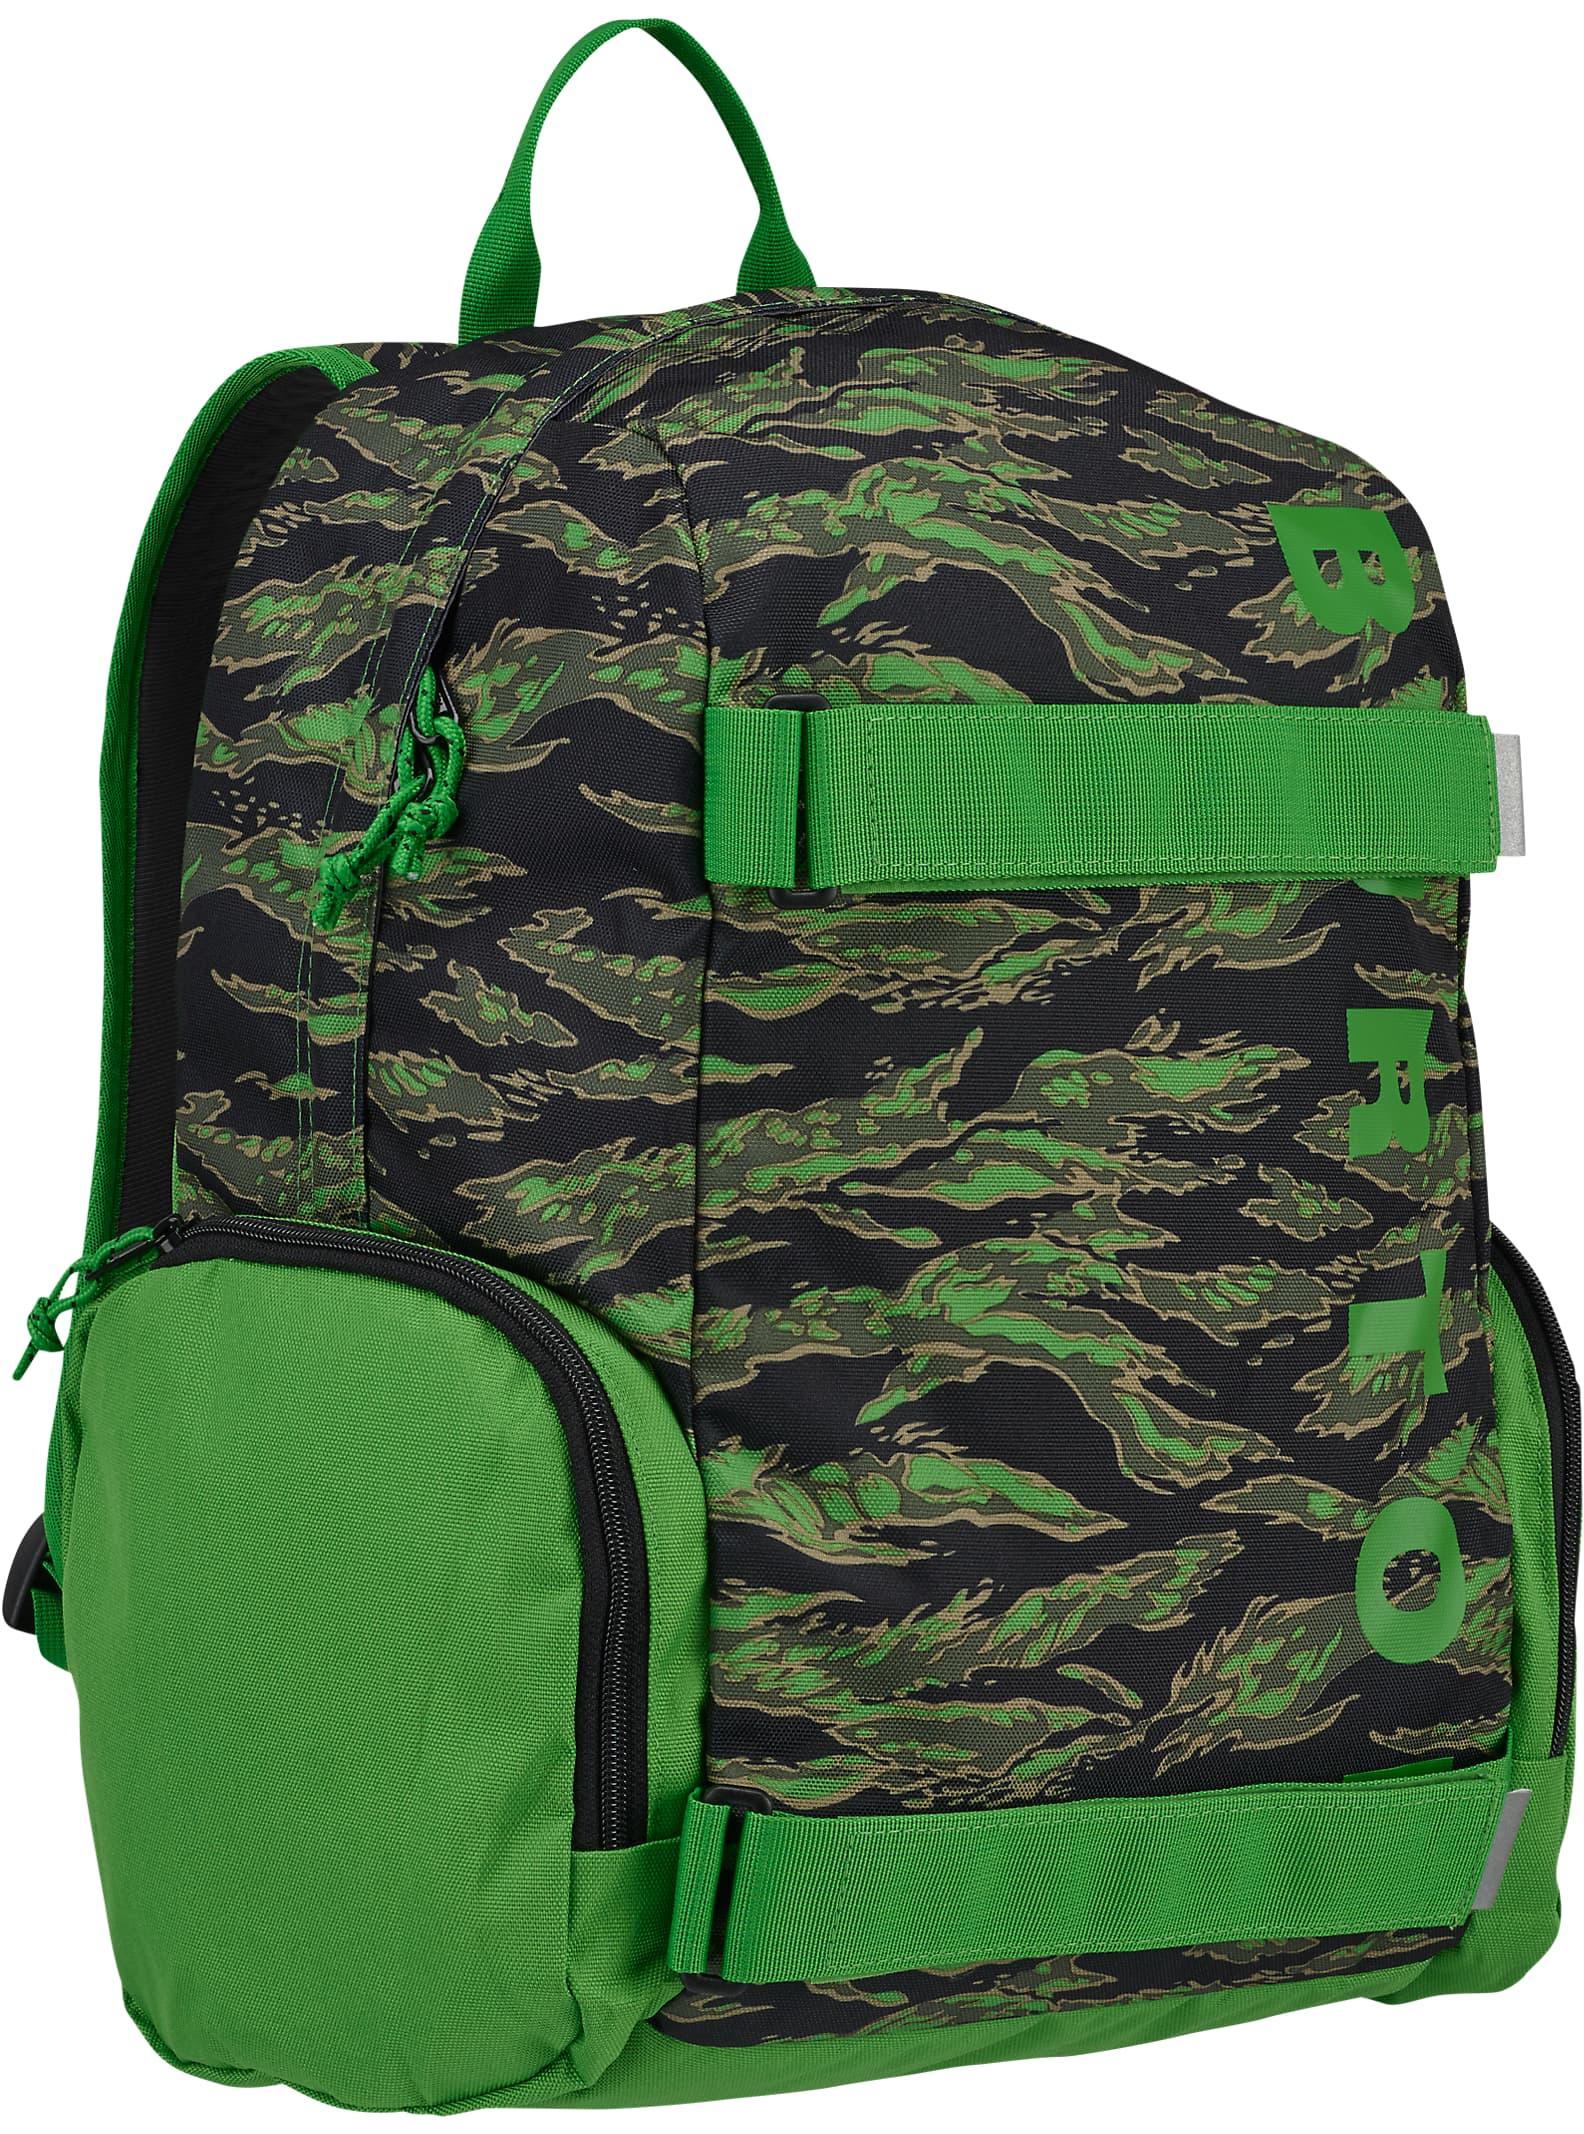 bf99d8b5e62b1 Burton Youth Emphasis Backpack